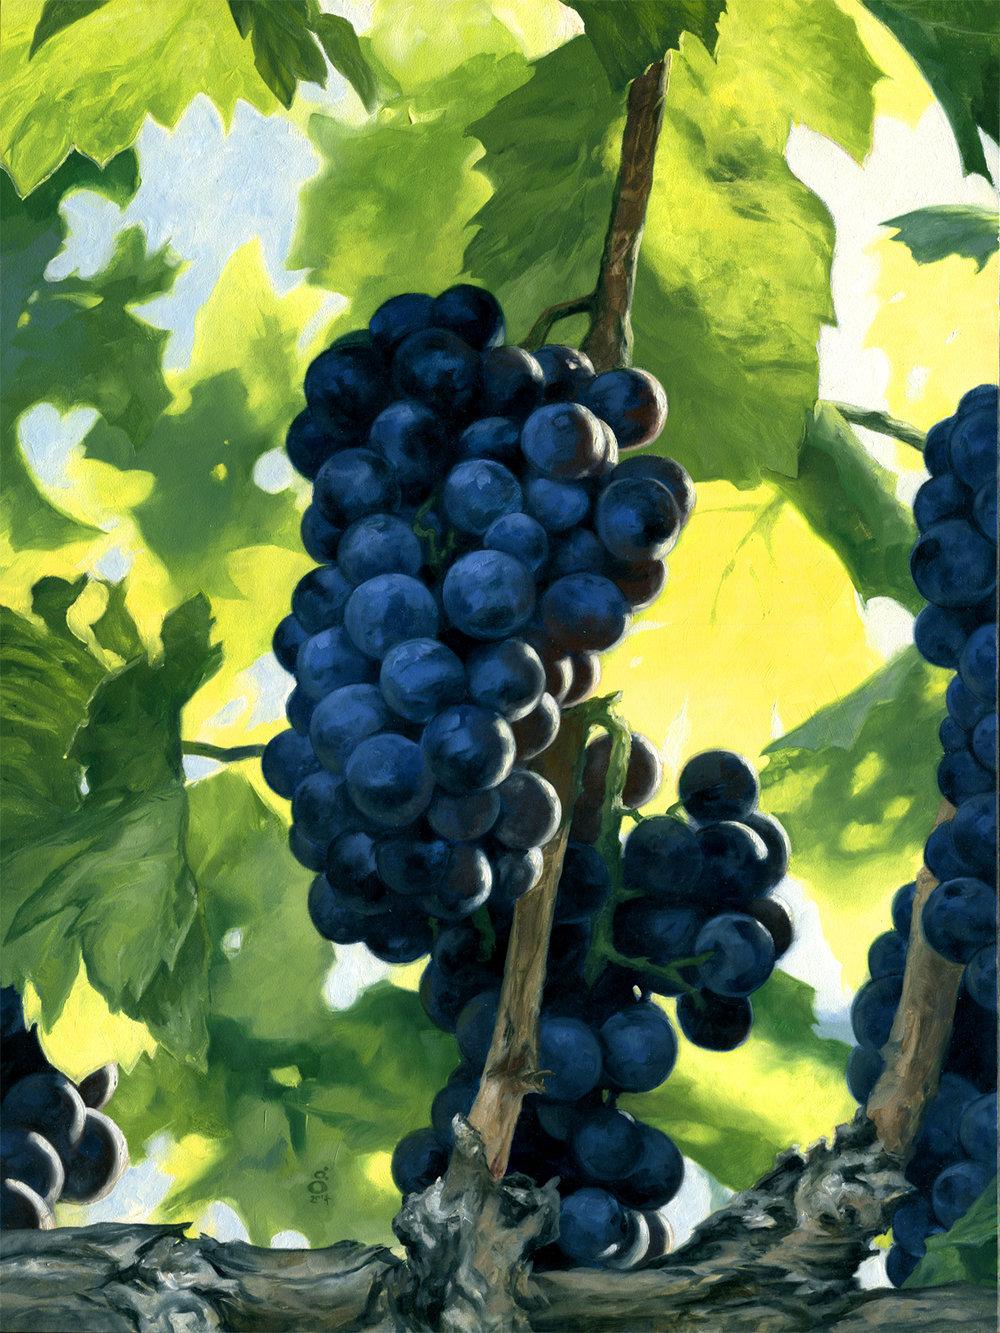 On the Vine